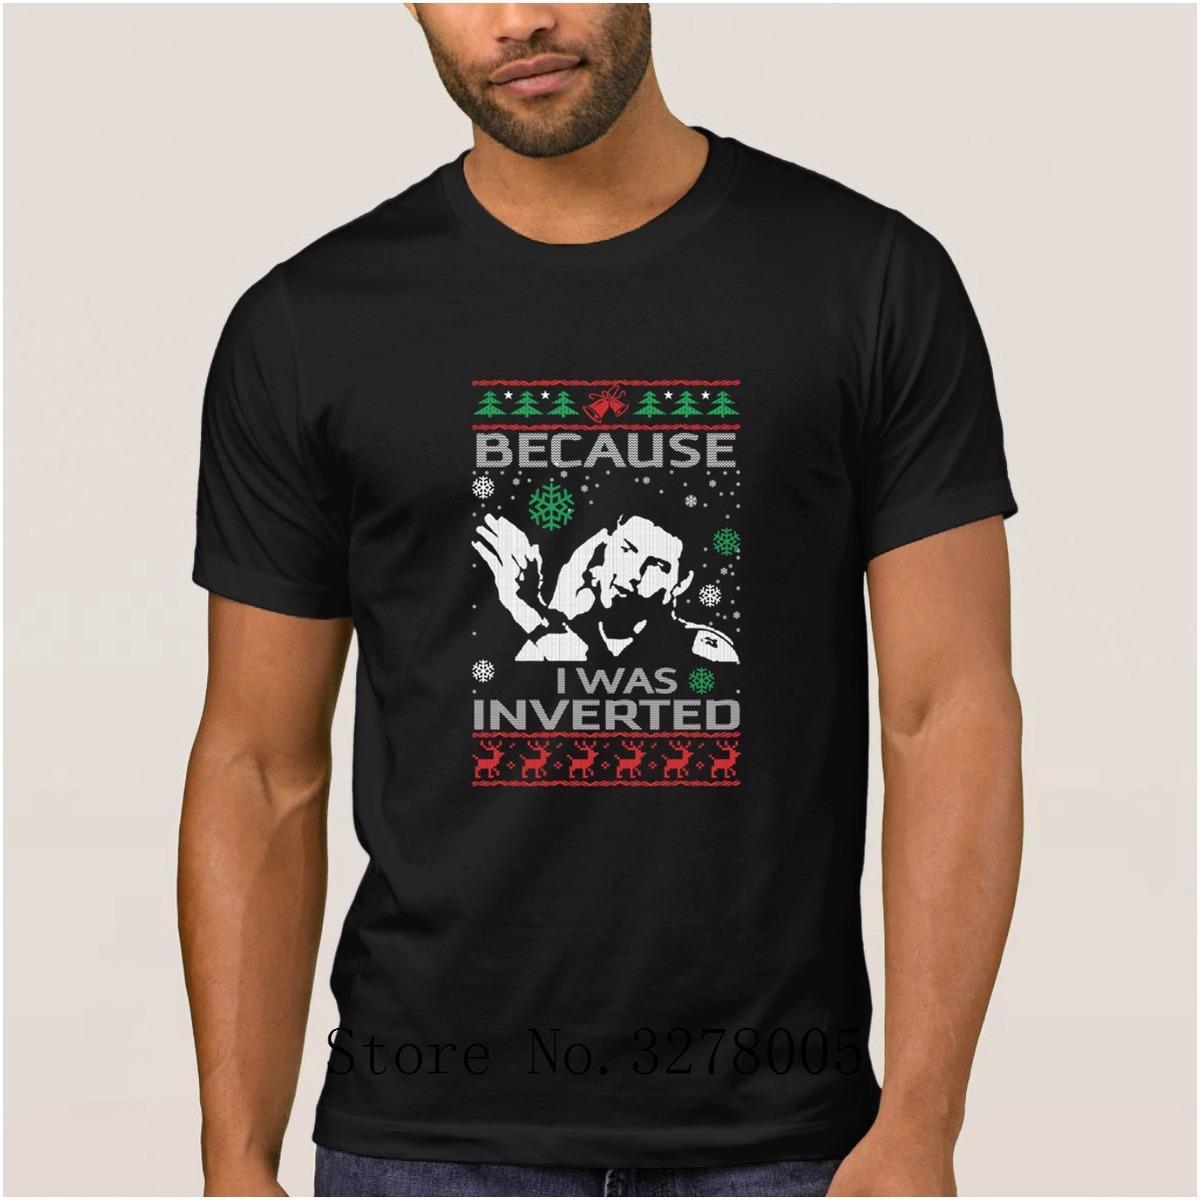 86c06a8a8 Fashionable Top Gun Because I Was Inverted T Shirt Men Spring Autumn  Regular T Shirt For Men Streetwear Cotton Tee Shirt Man T Shirts Very Funny T  Shirts ...